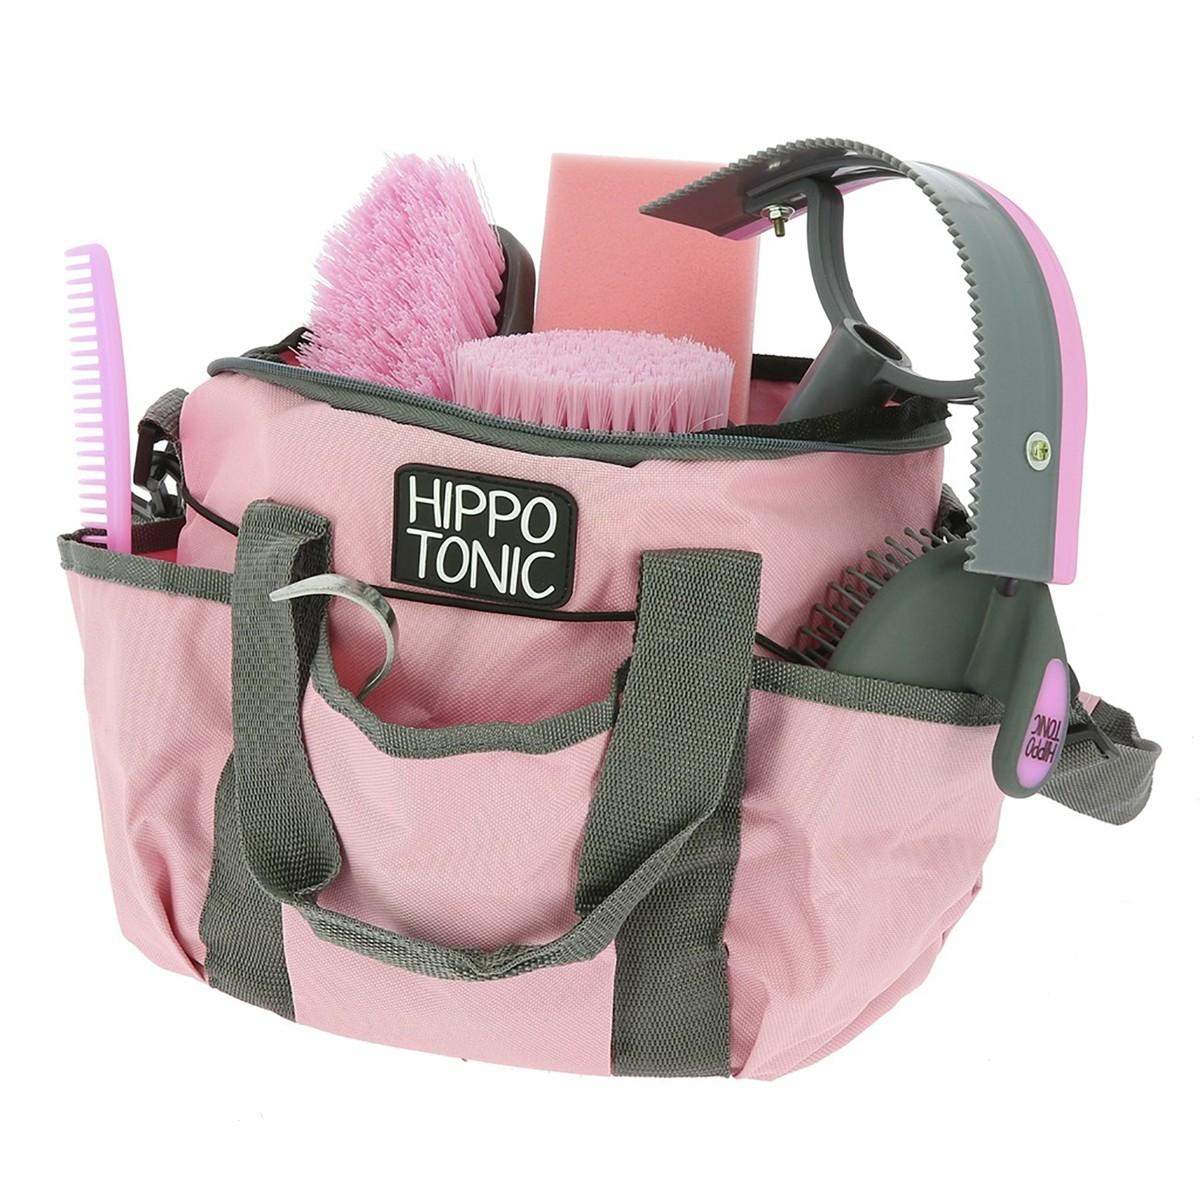 Hippotonic Pro 3 Pink Grooming Kit & Bag